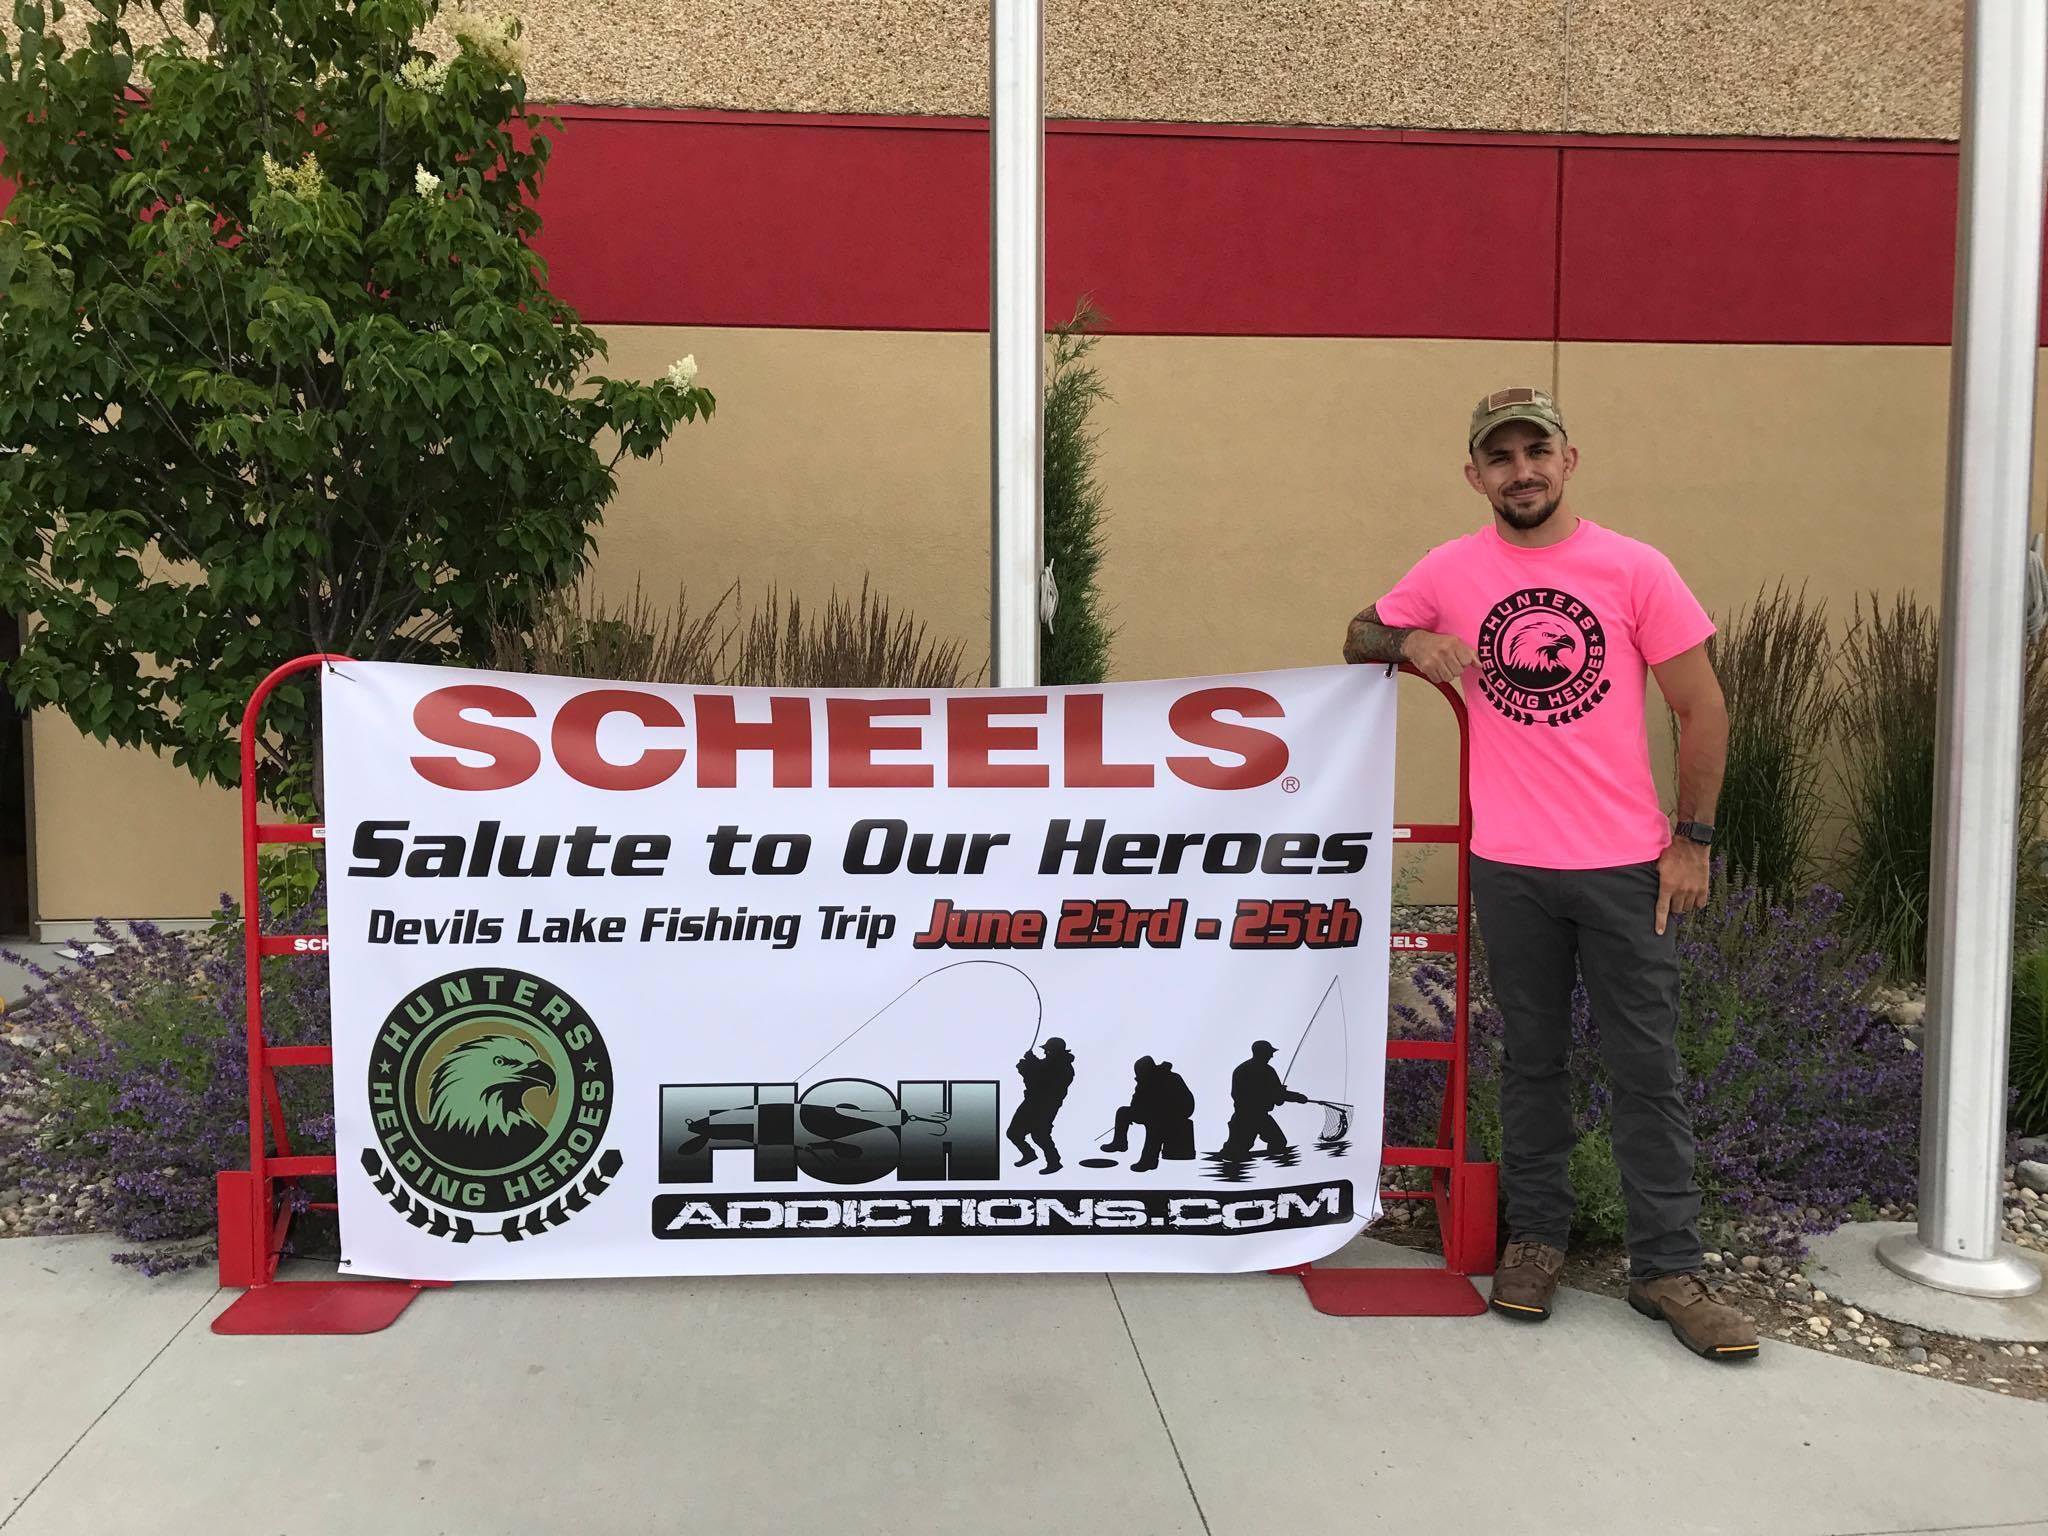 Shane Kruchten, Scheels, Hunters Helping Heroes